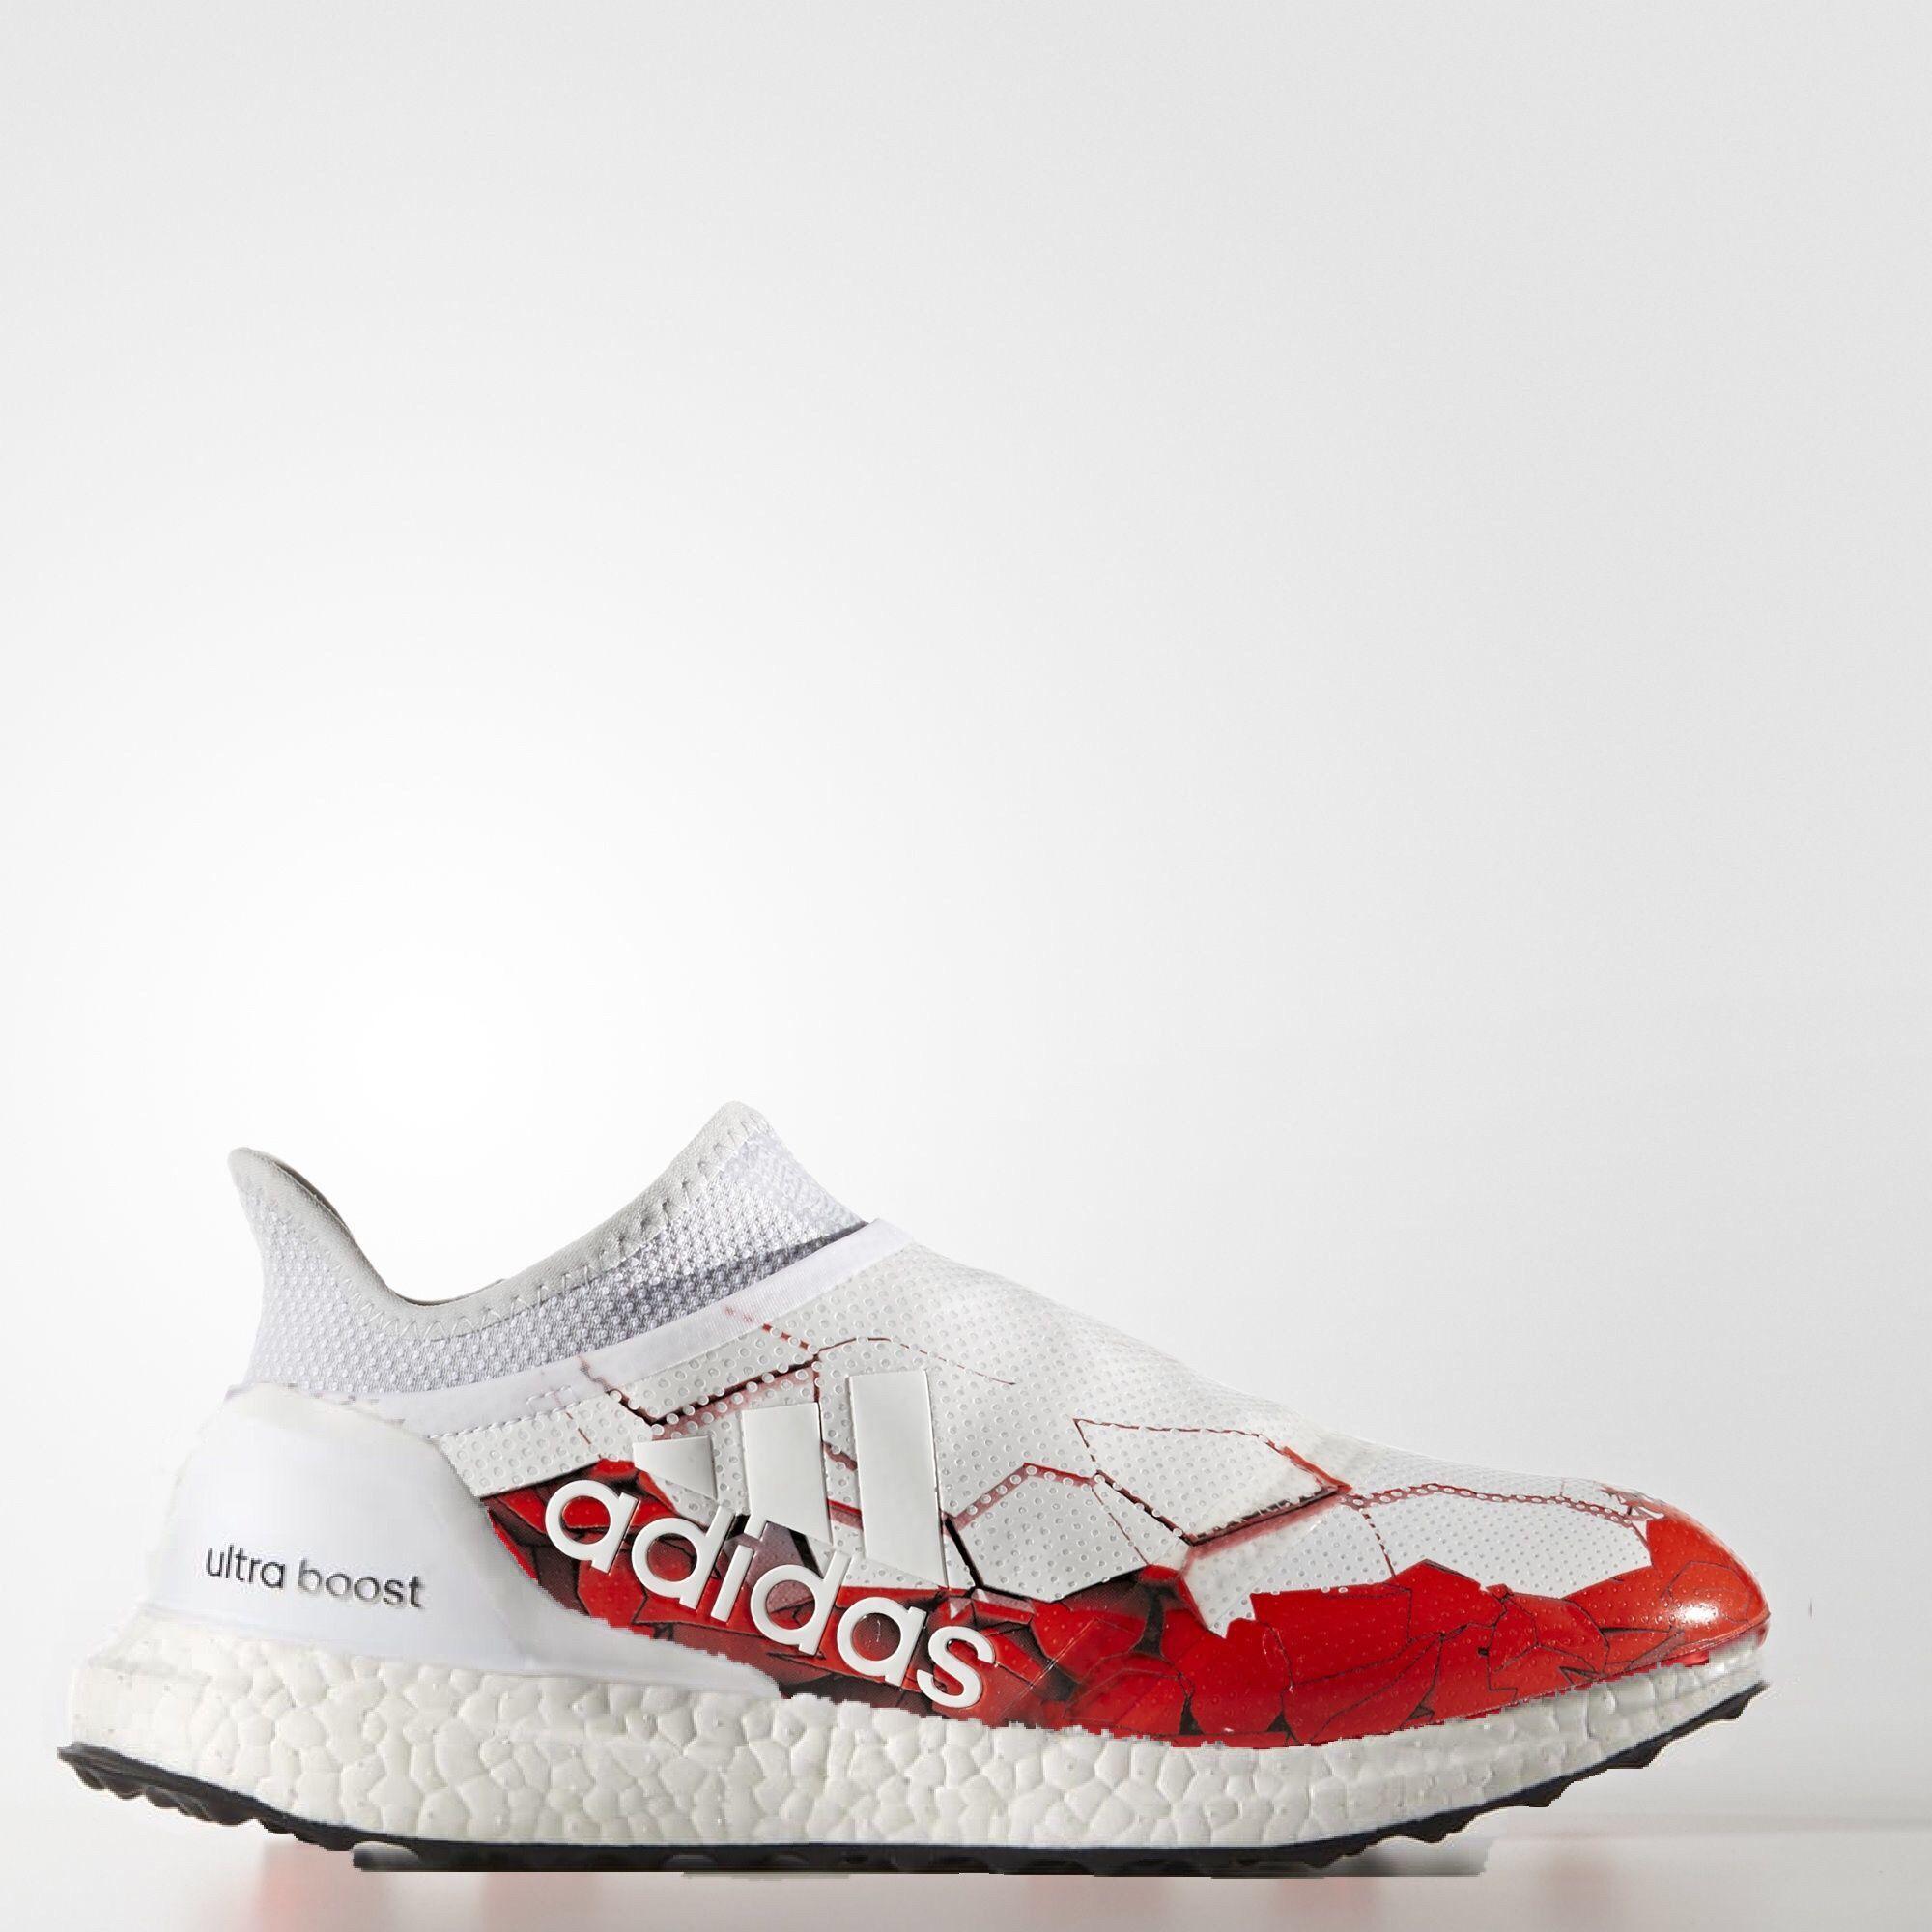 adidas ace 16 ultra stivali scarpe da ginnastica nero